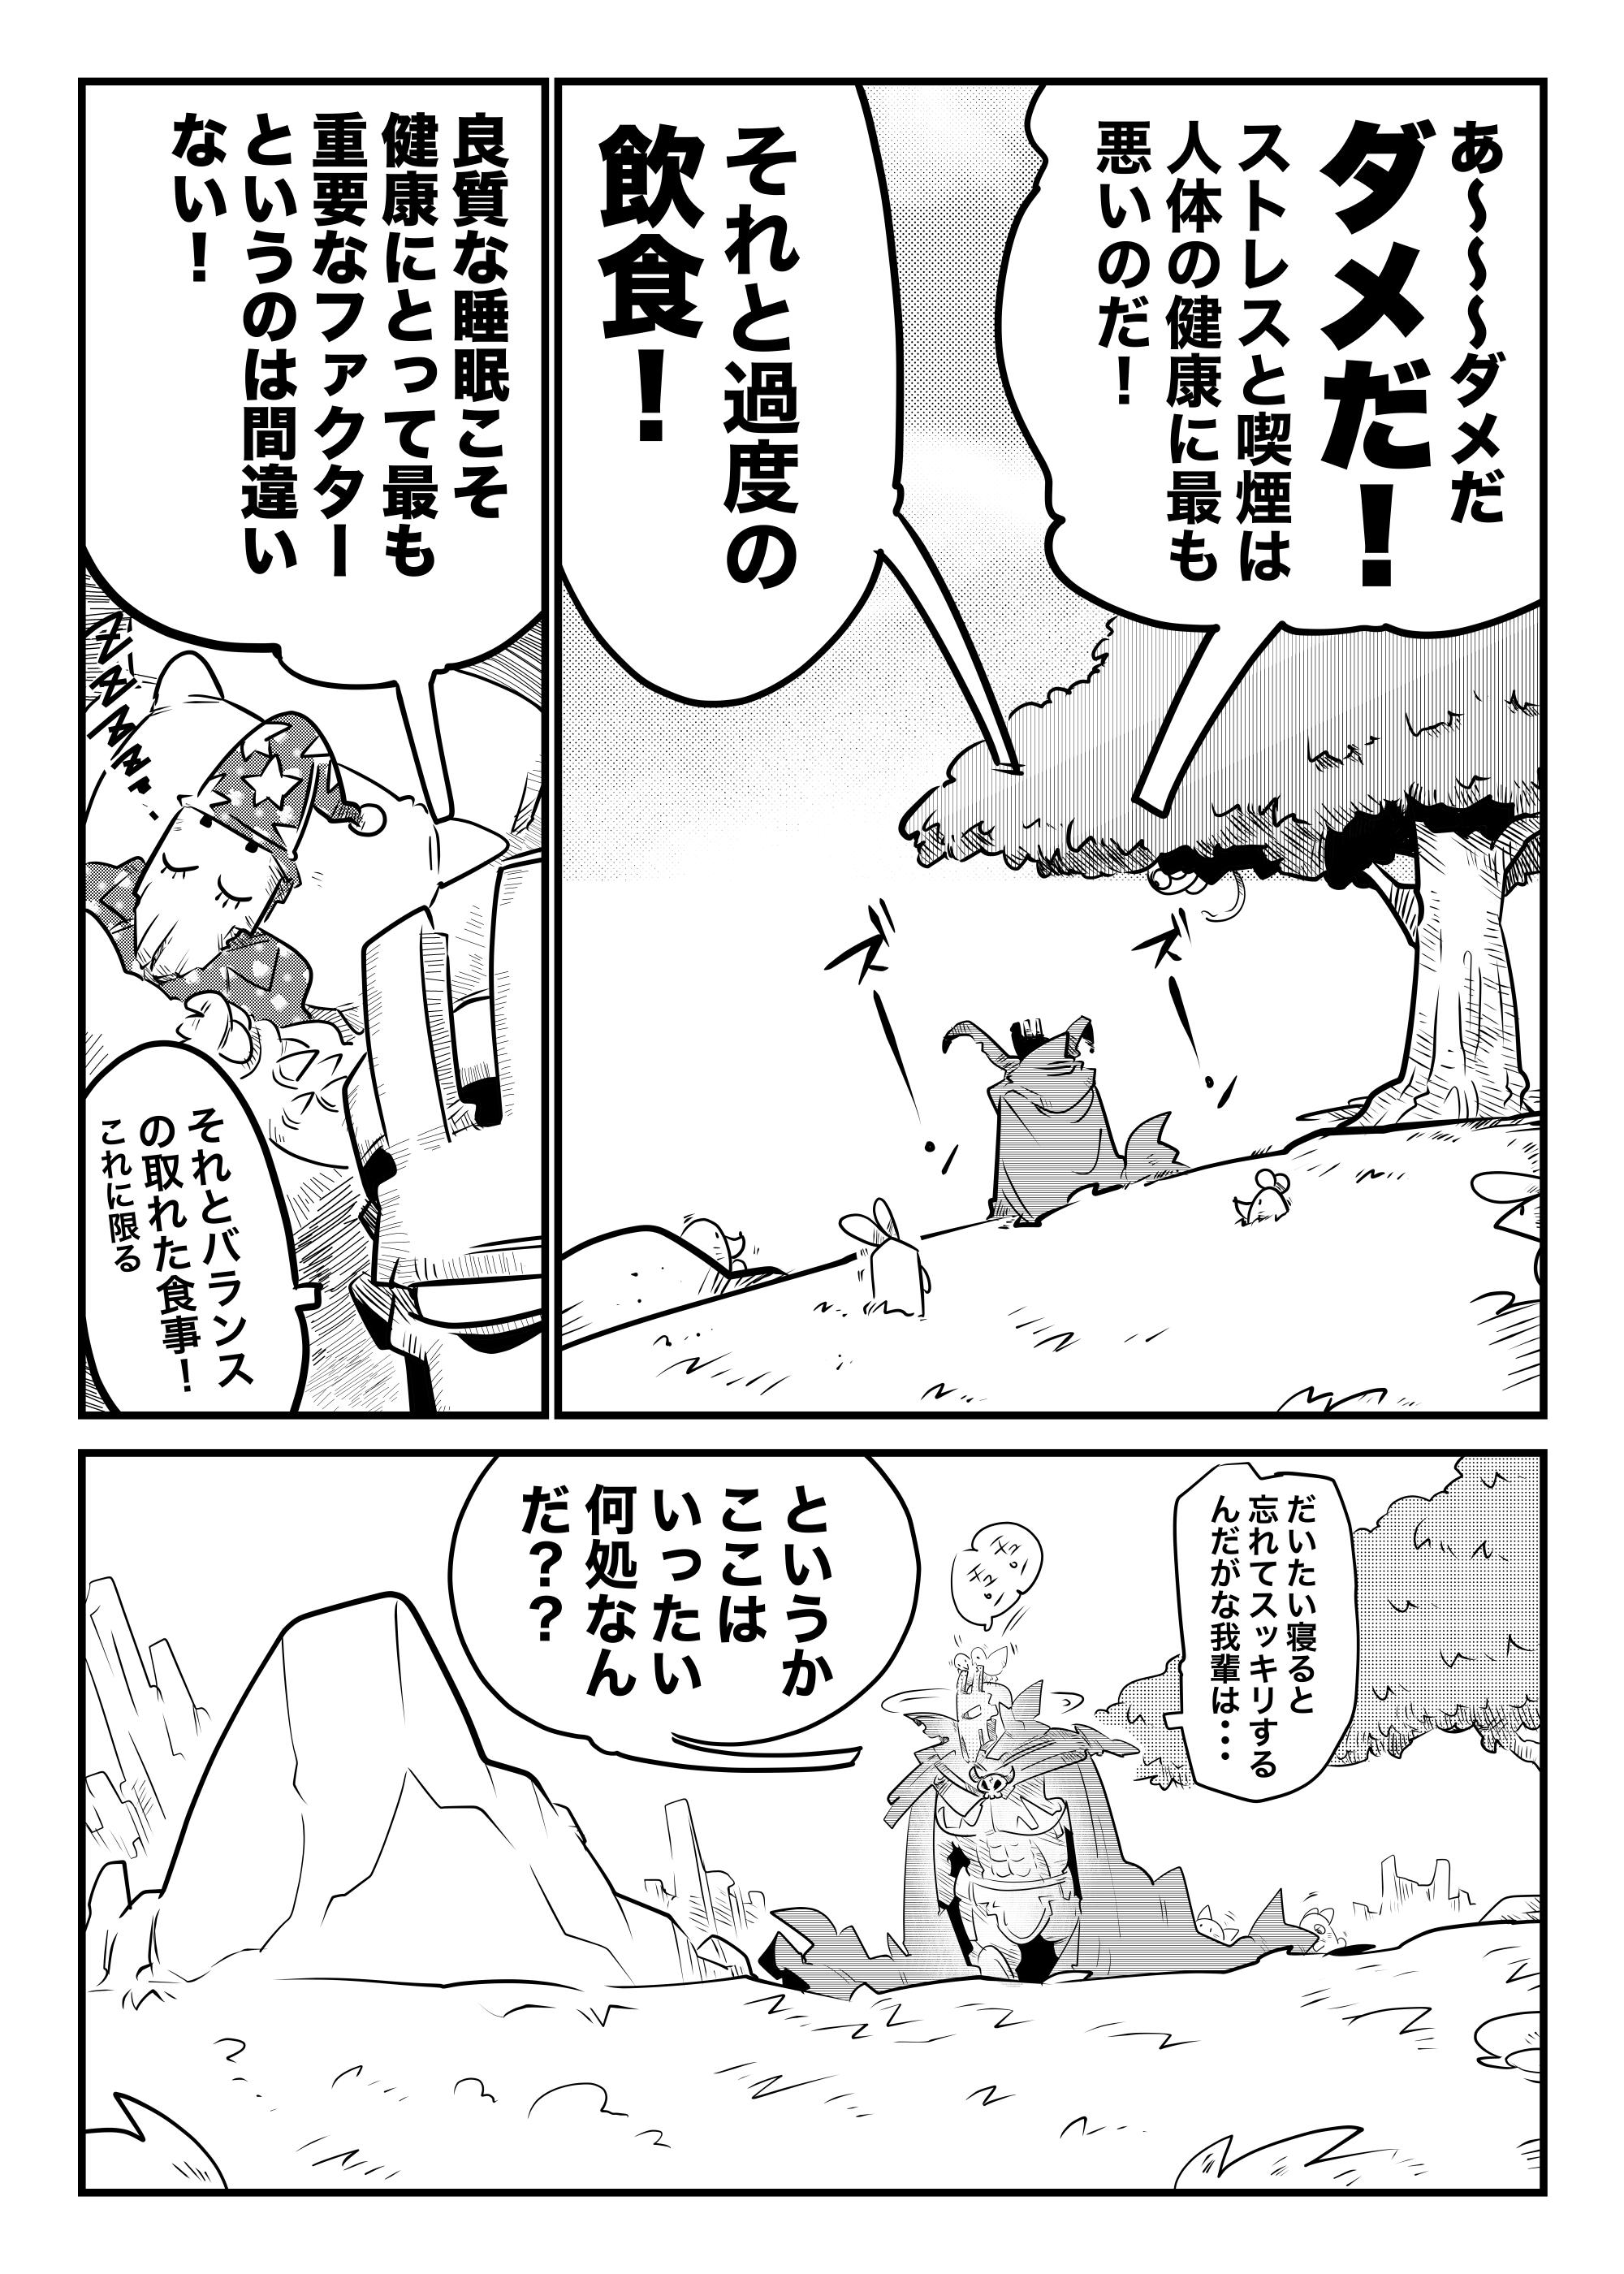 f:id:terashimaru117:20210914182948p:plain